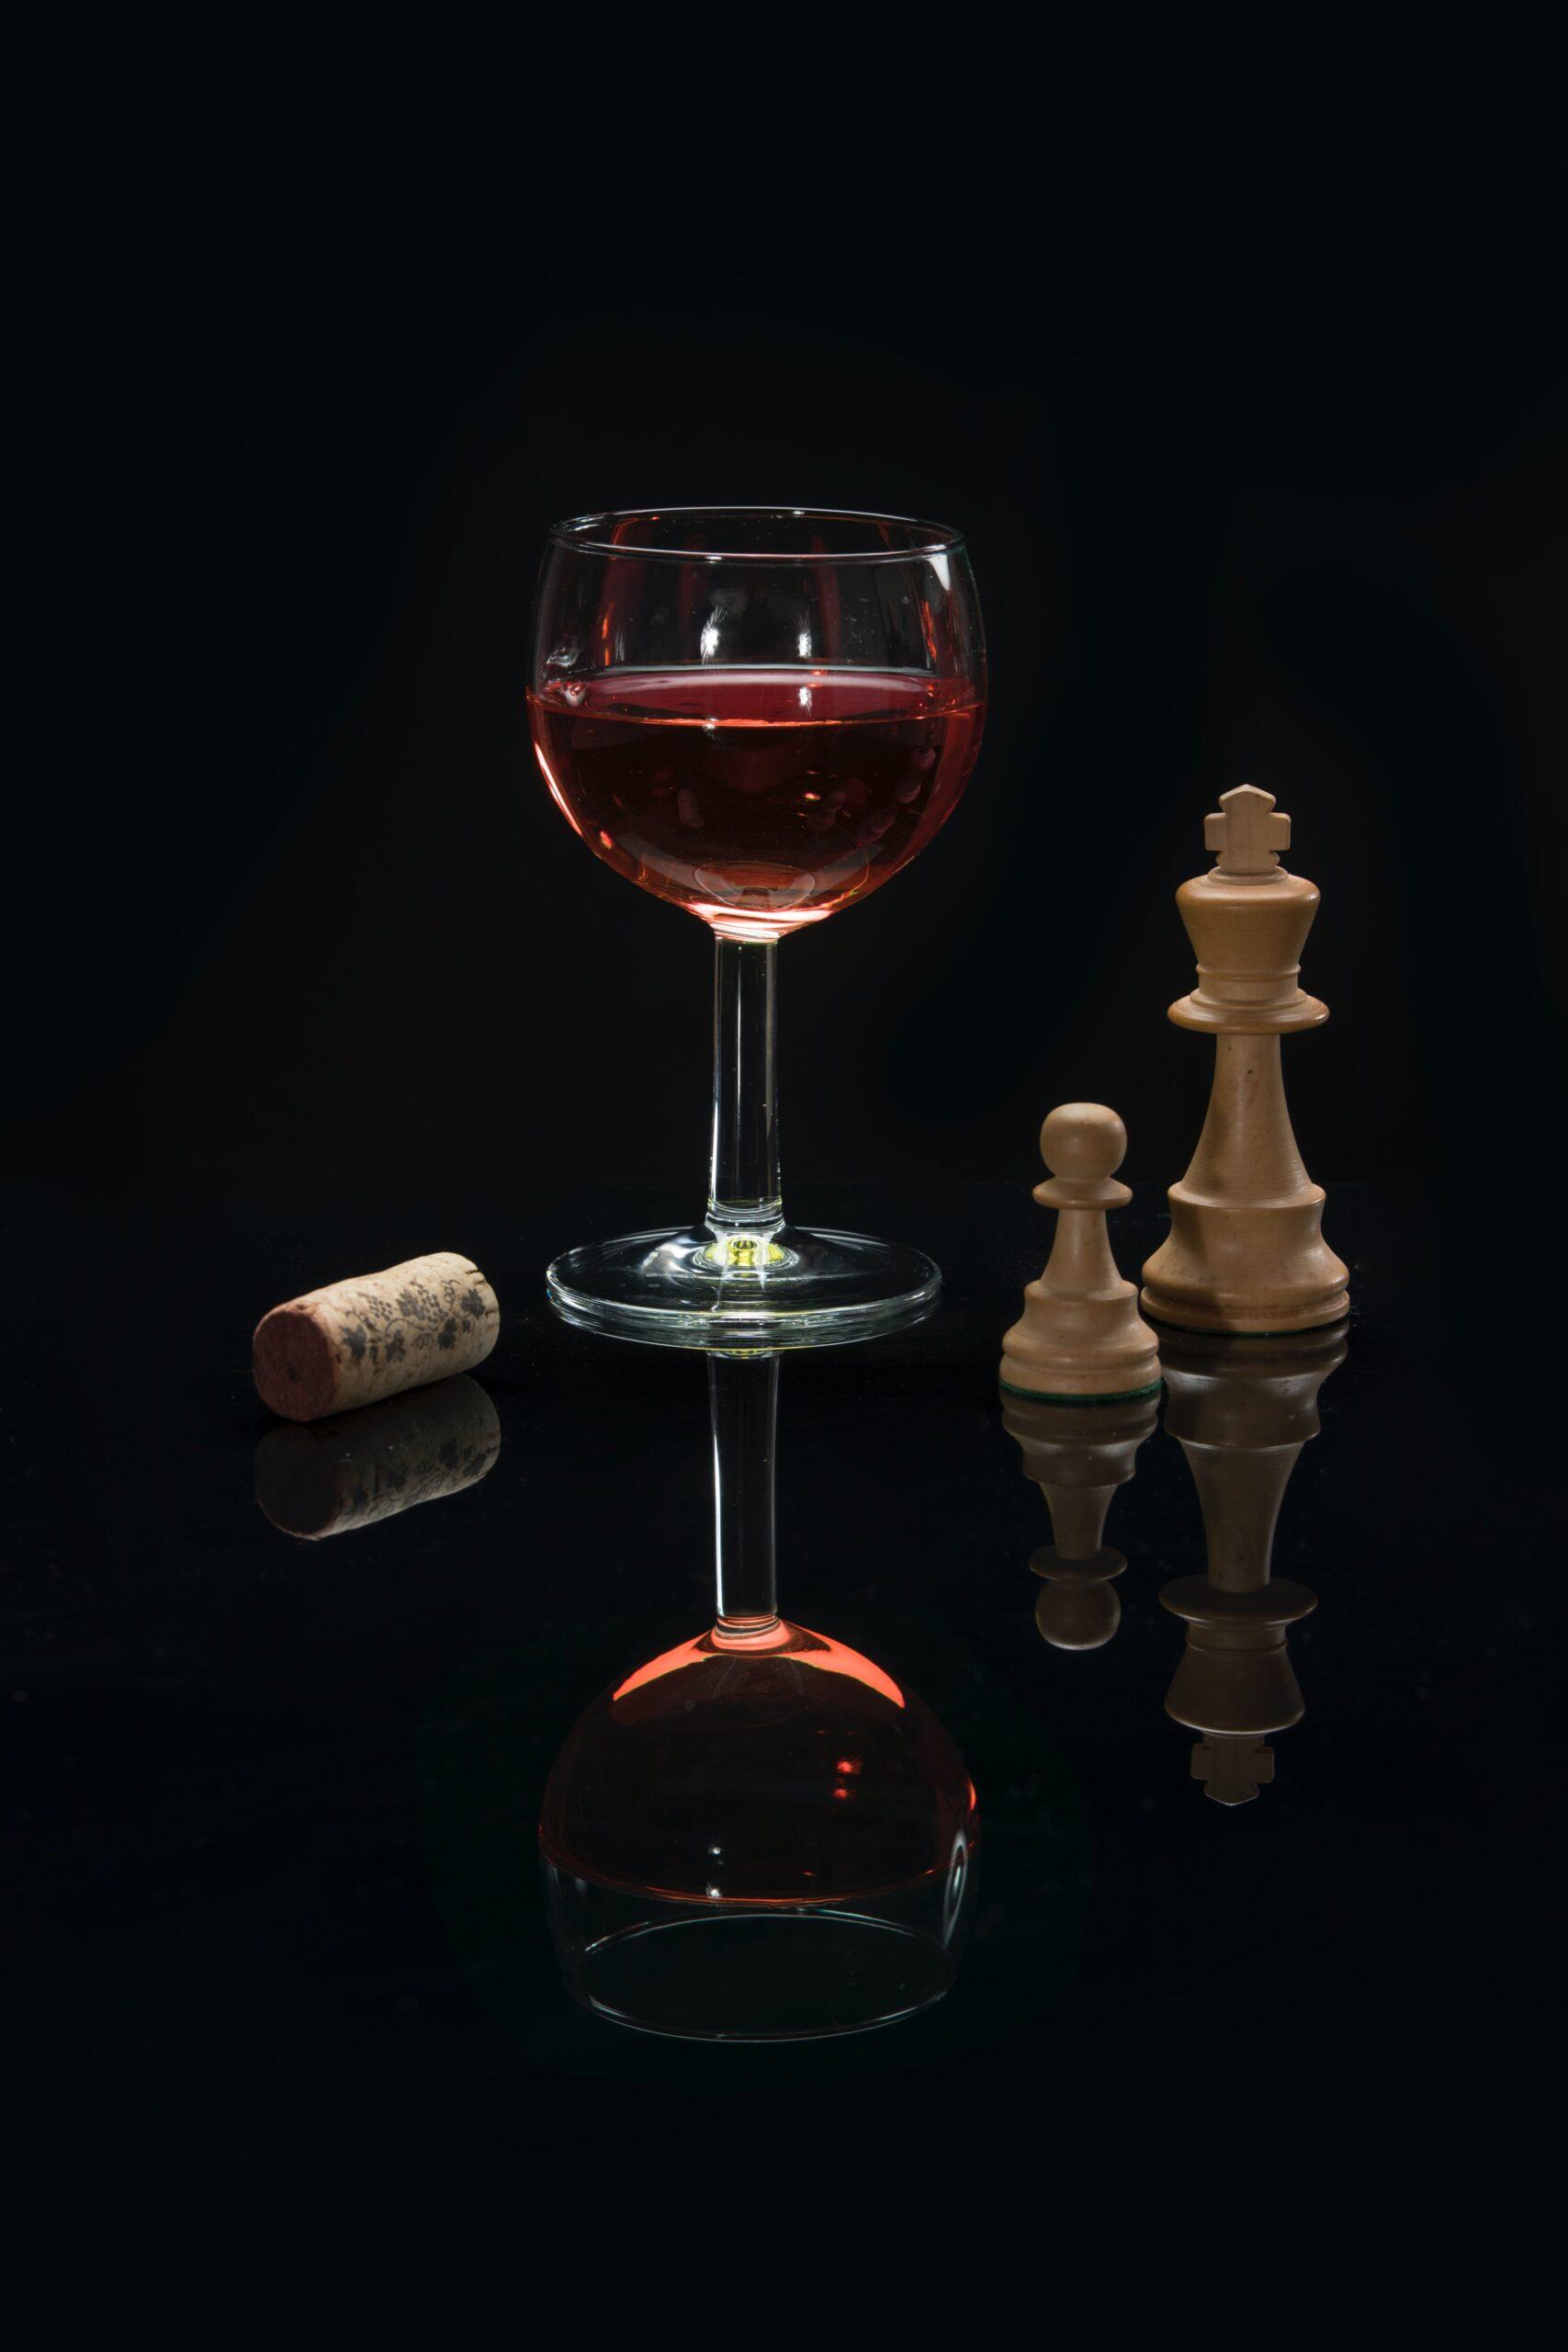 Juegos vino